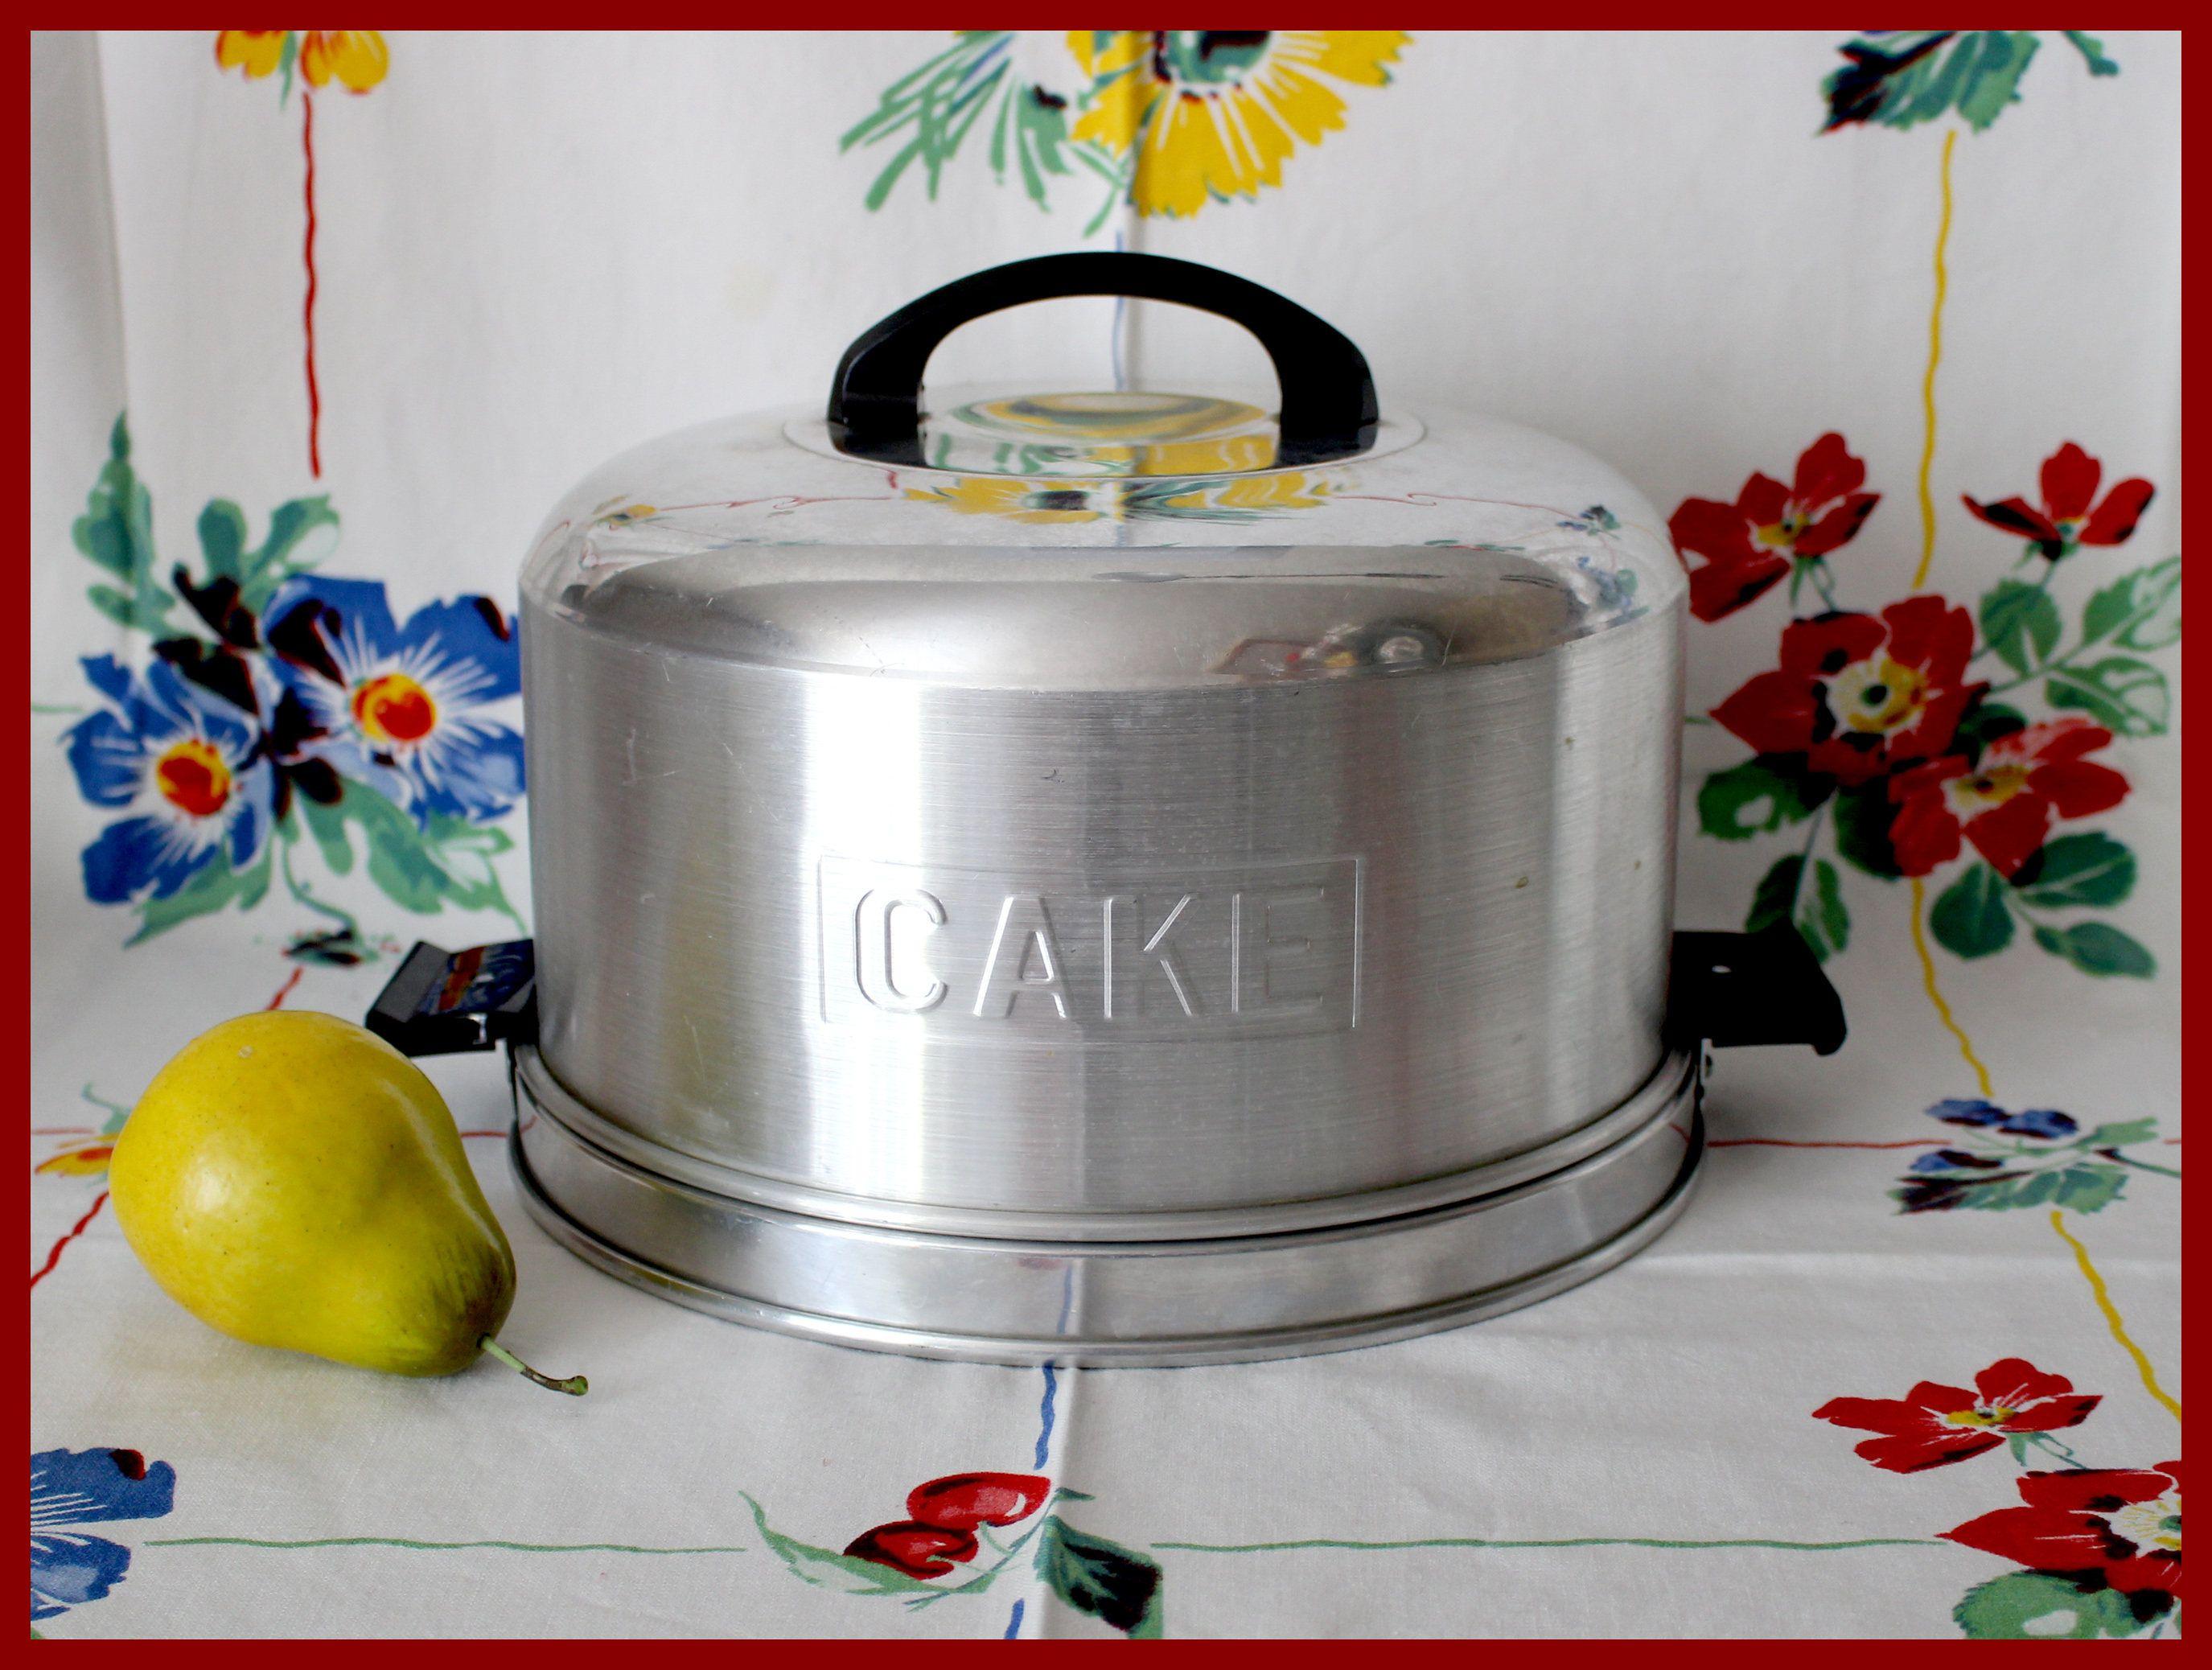 Kromex cake saver cake carrier brushed aluminum locking